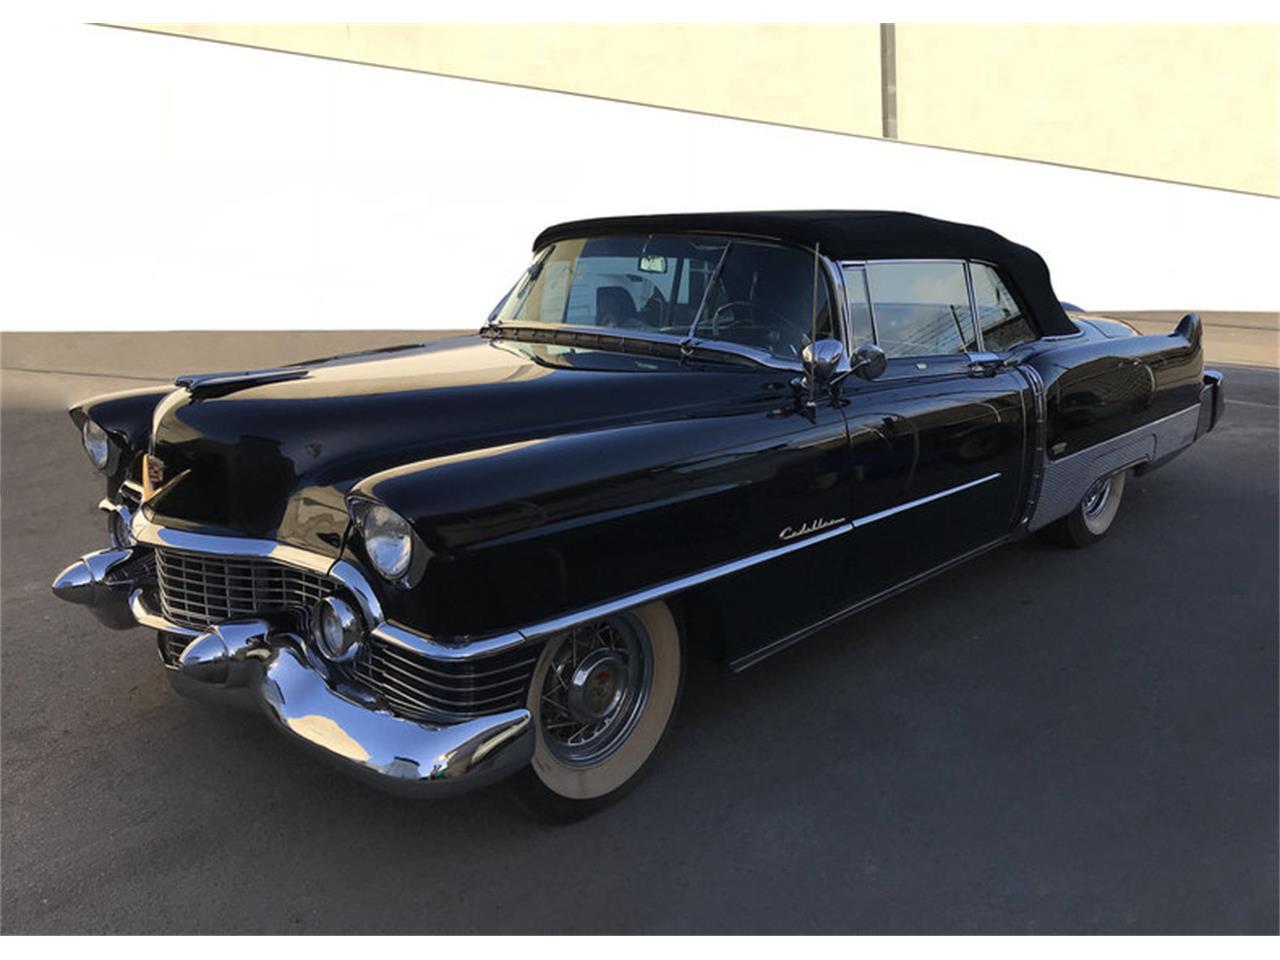 75 1954 Cadillacs Cadillac Series Fleetwood 8 Passenger Sedan Deville Seventy Five Notoriousluxury Large Picture Of 54 Eldorado Auction Vehicle